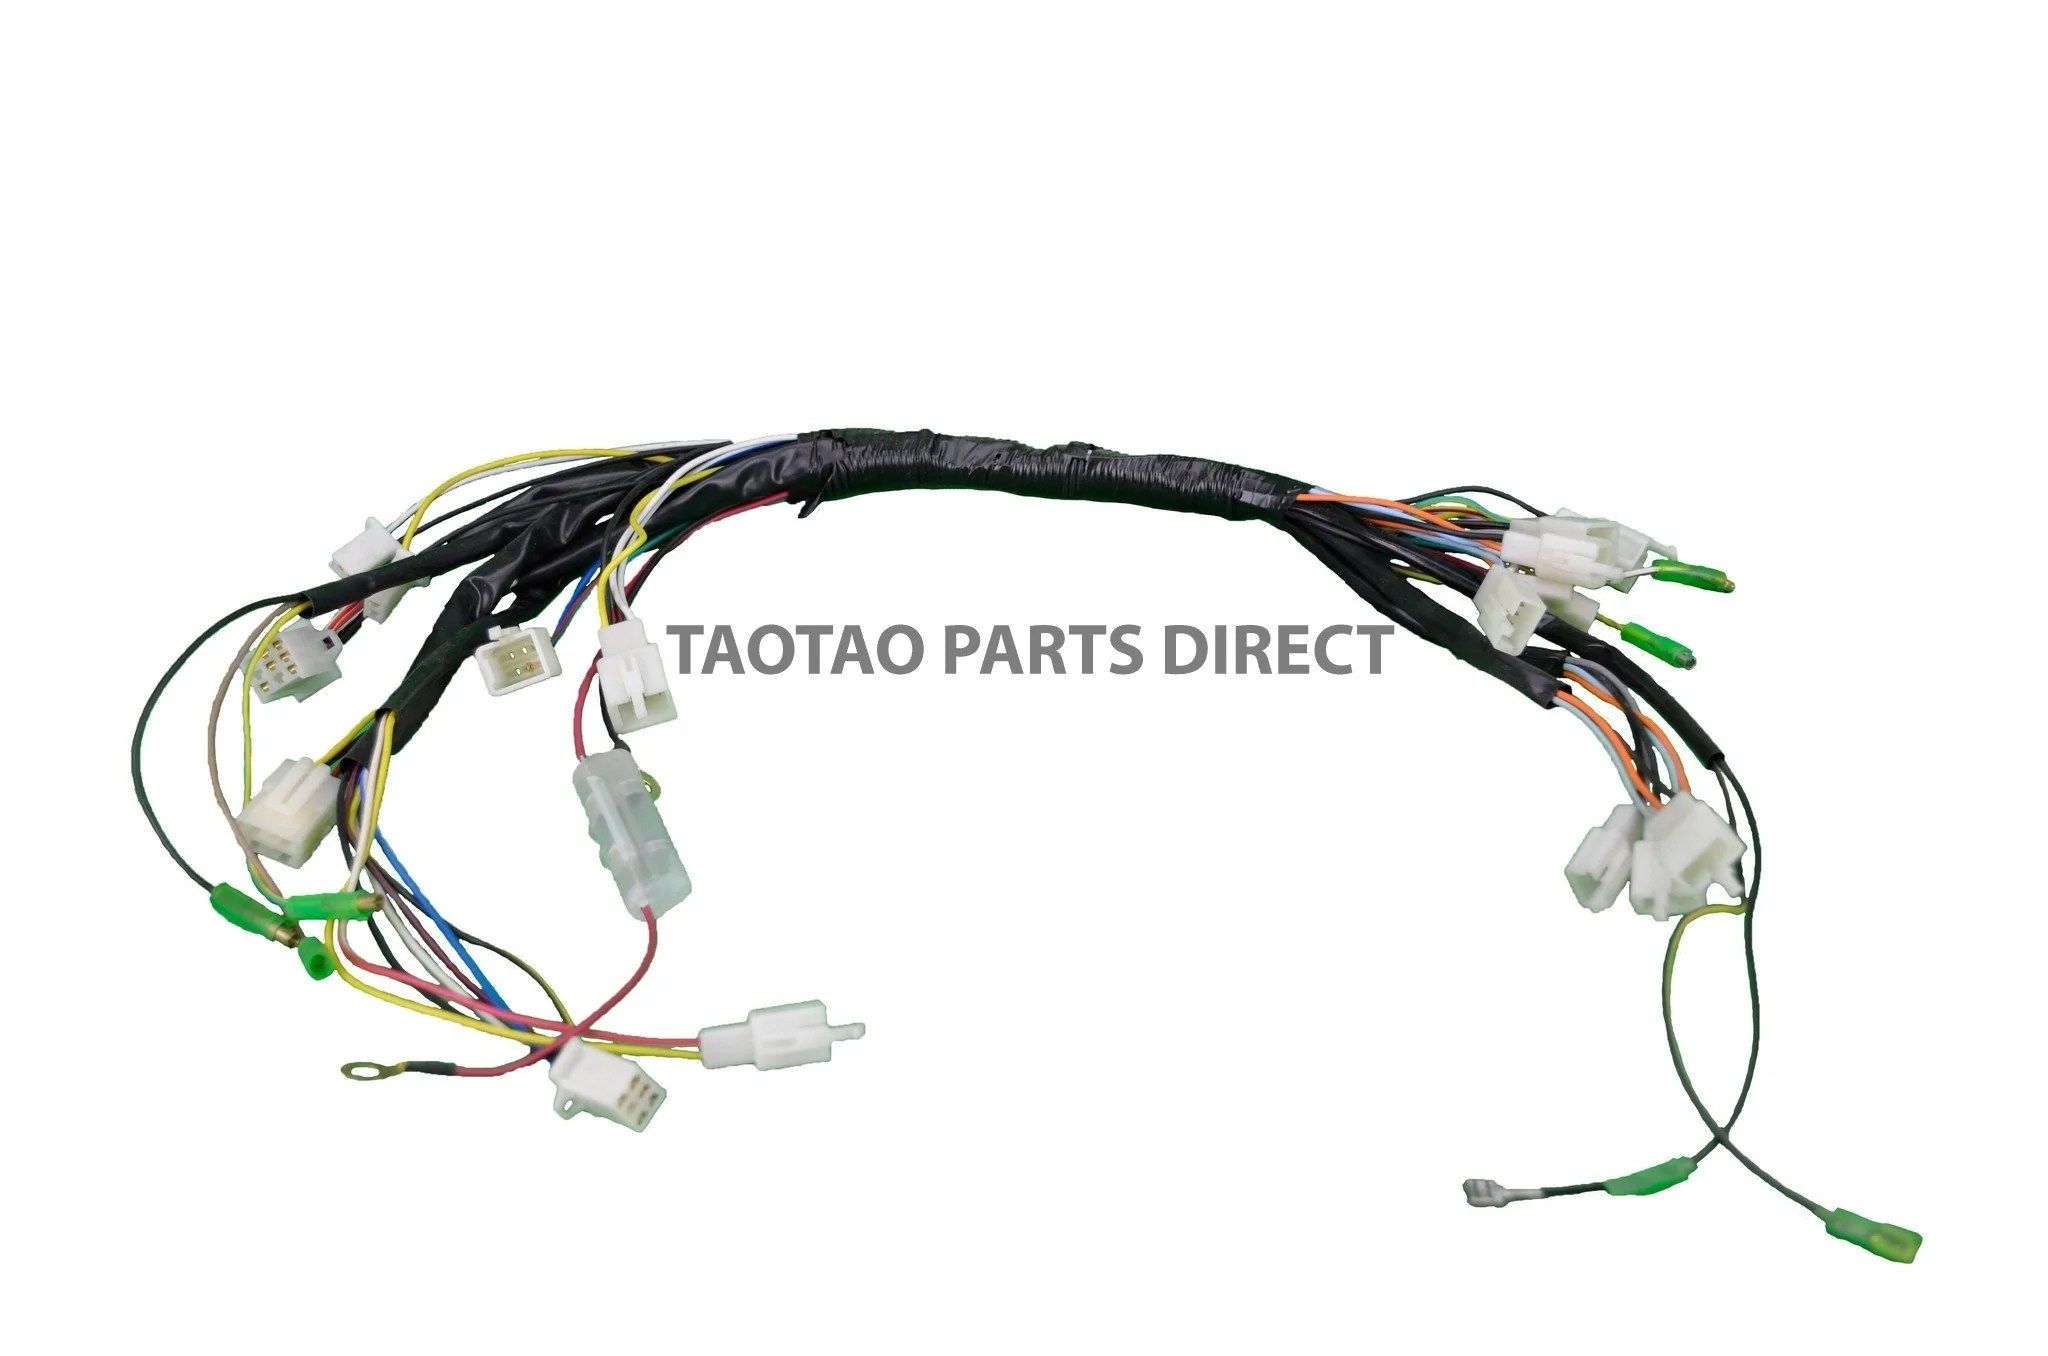 medium resolution of ata125d wire harness 15 taotaopartsdirect com